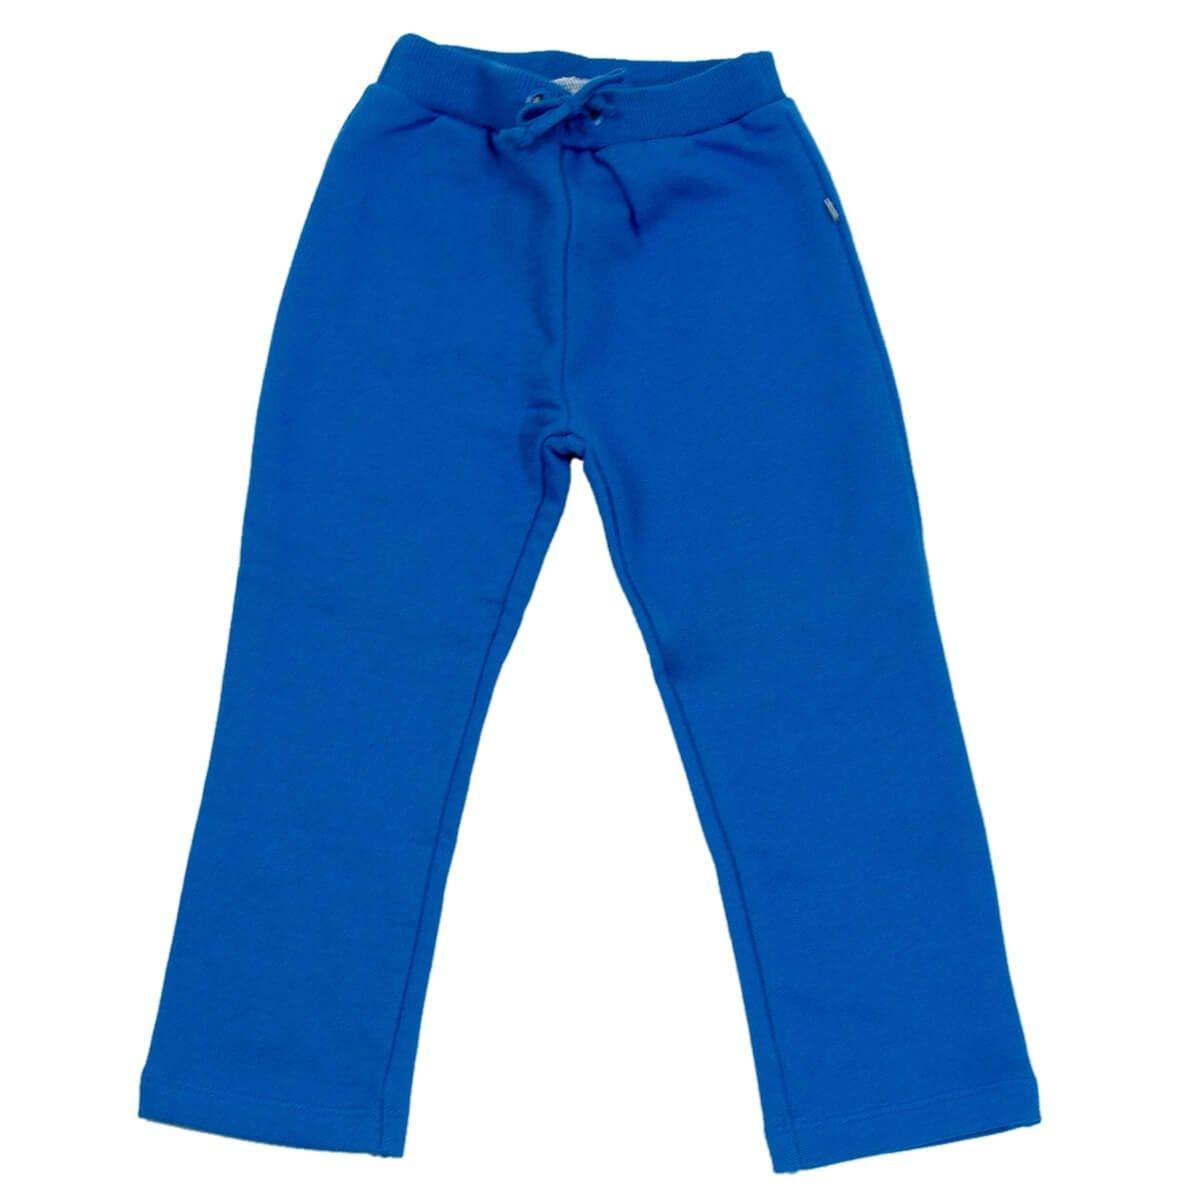 Bizz Store - Calça Infantil Menino Hering Kids Moletom 51868e6bd84